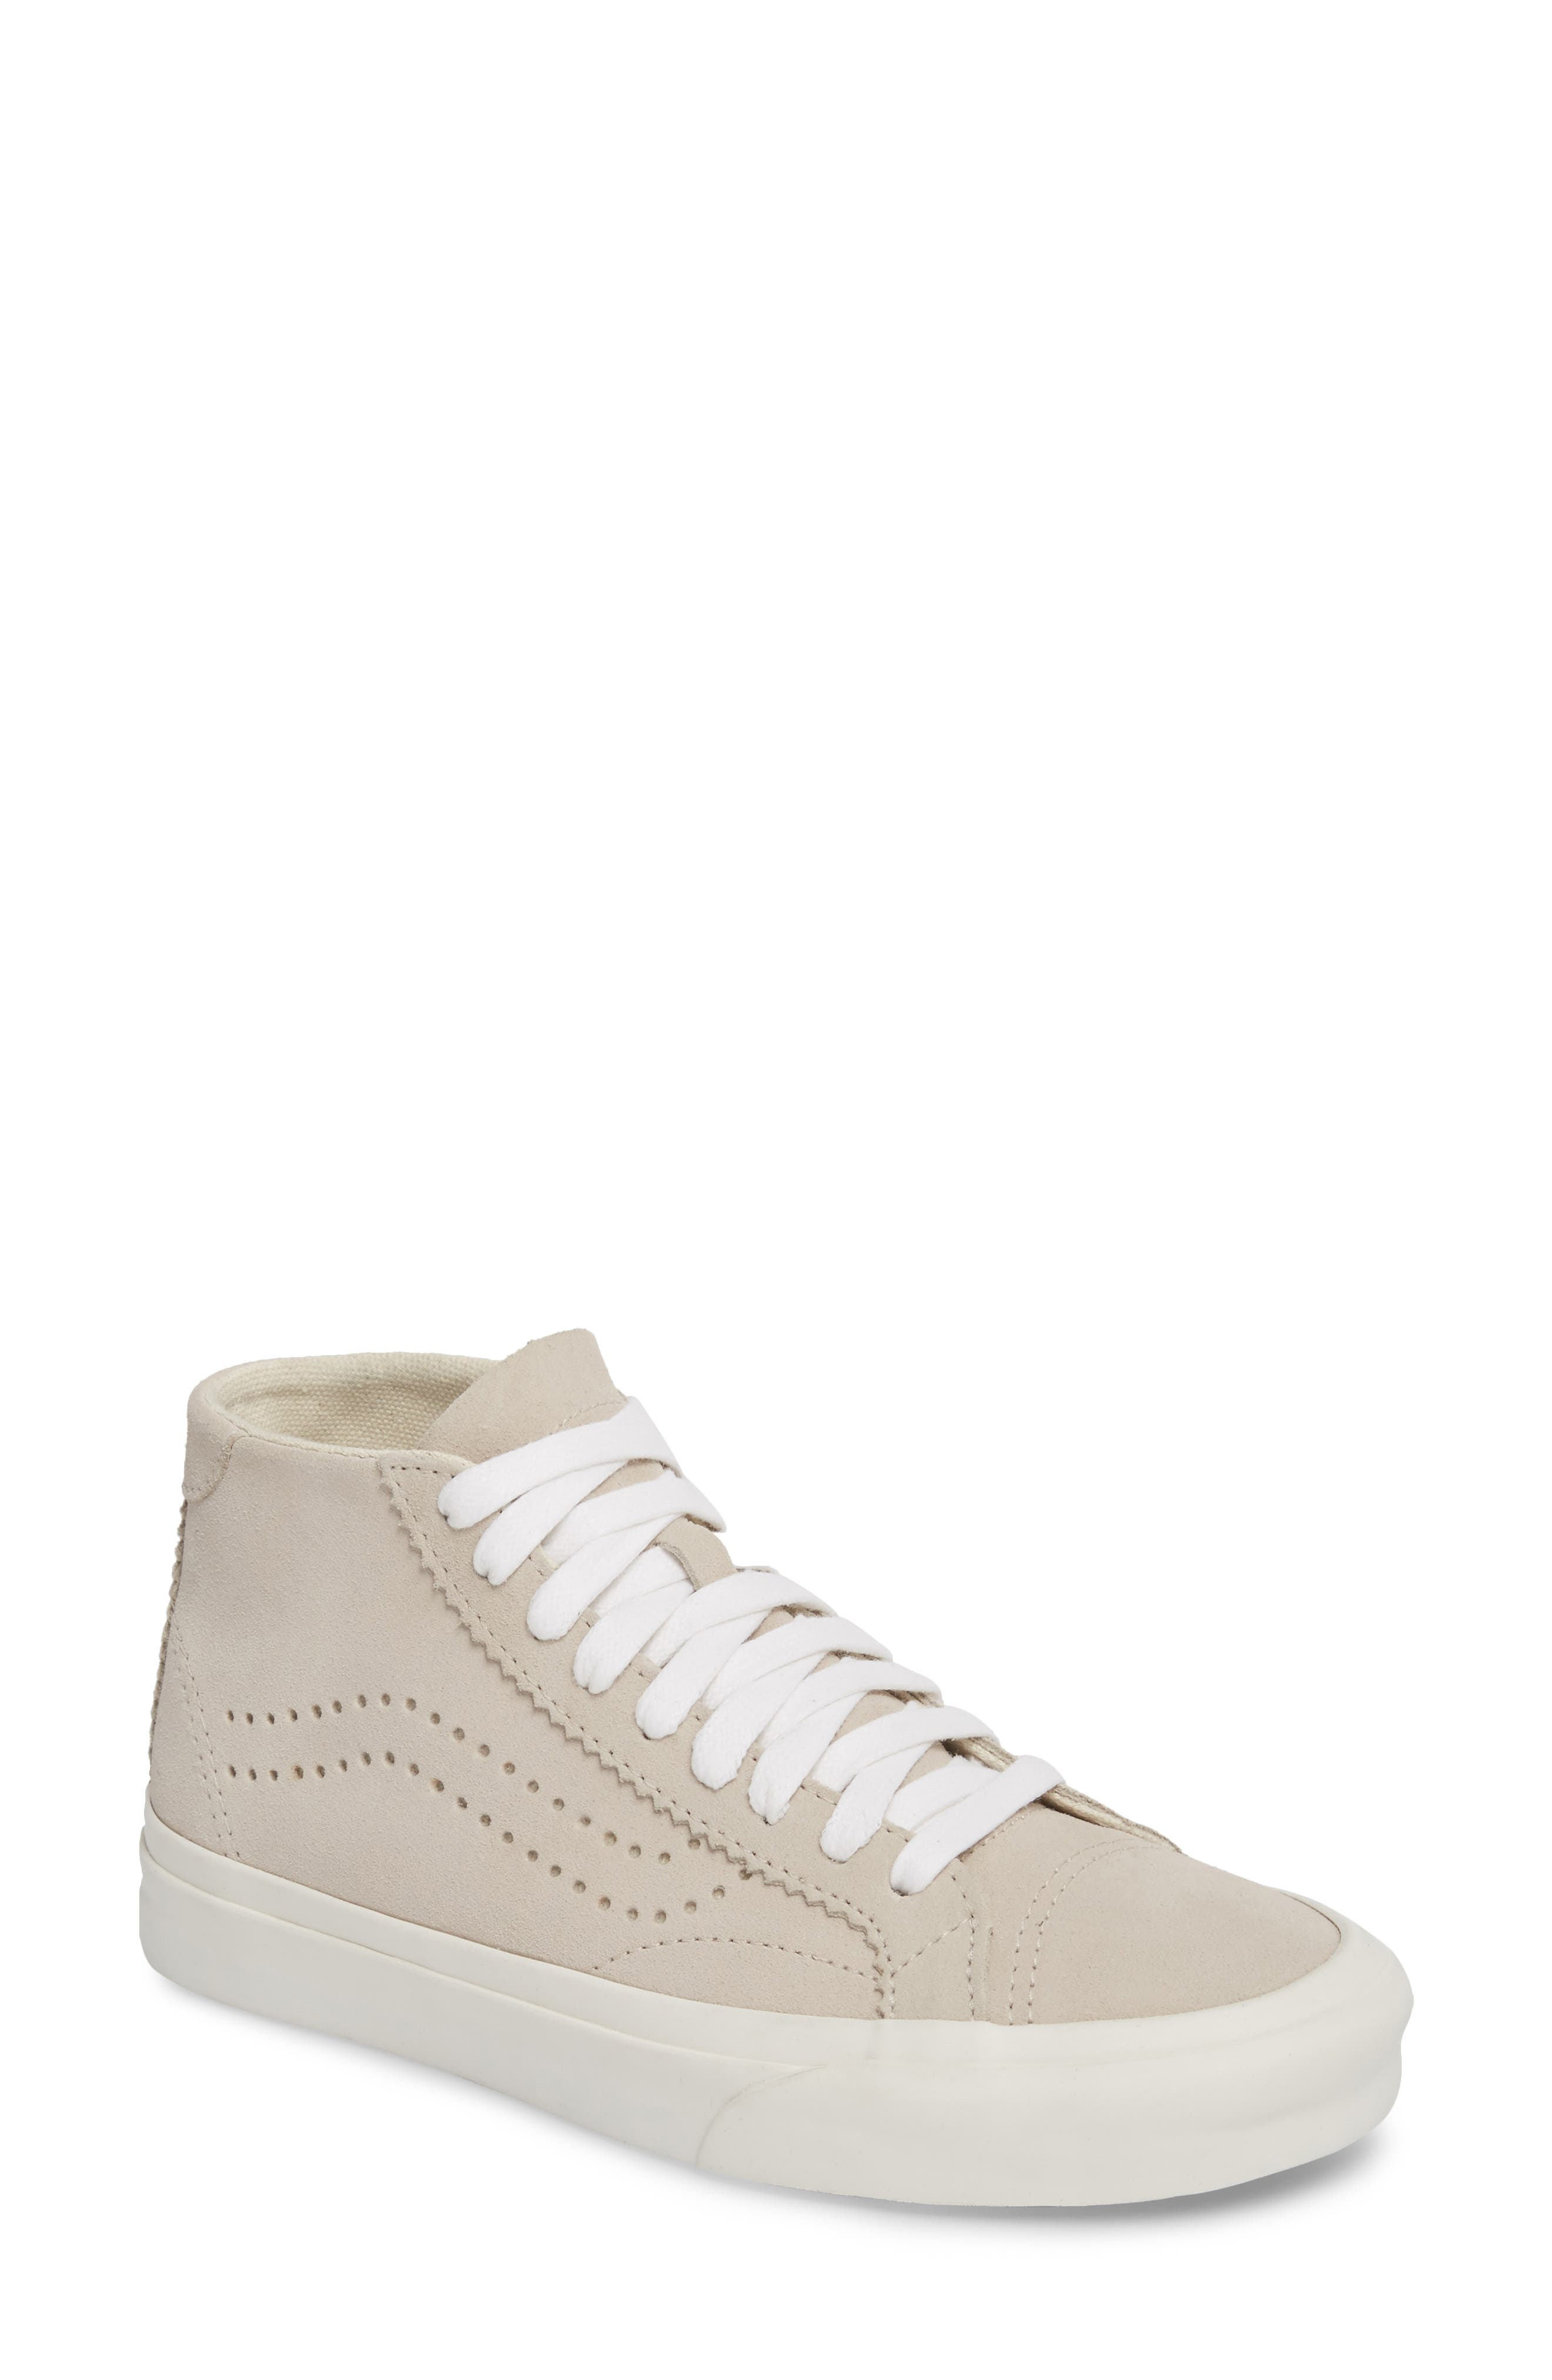 Court DX Mid Sneaker,                         Main,                         color,